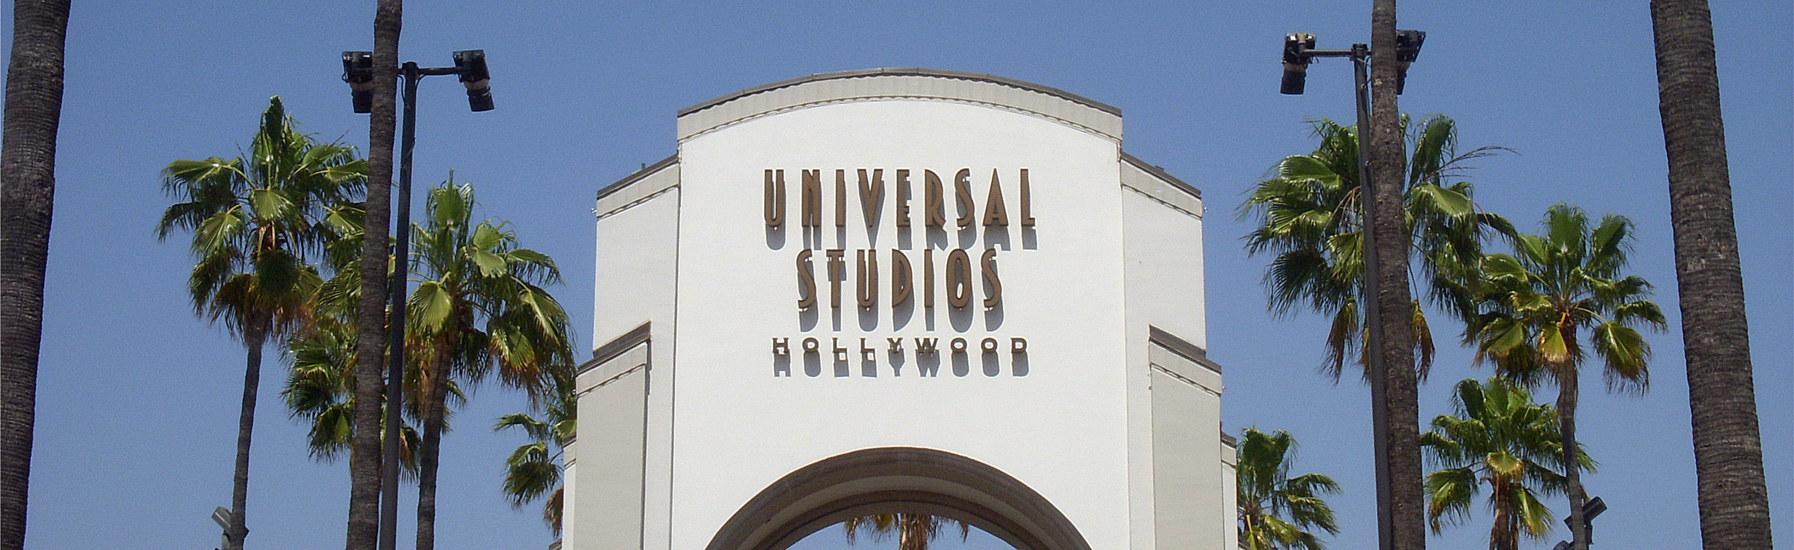 Universal panel